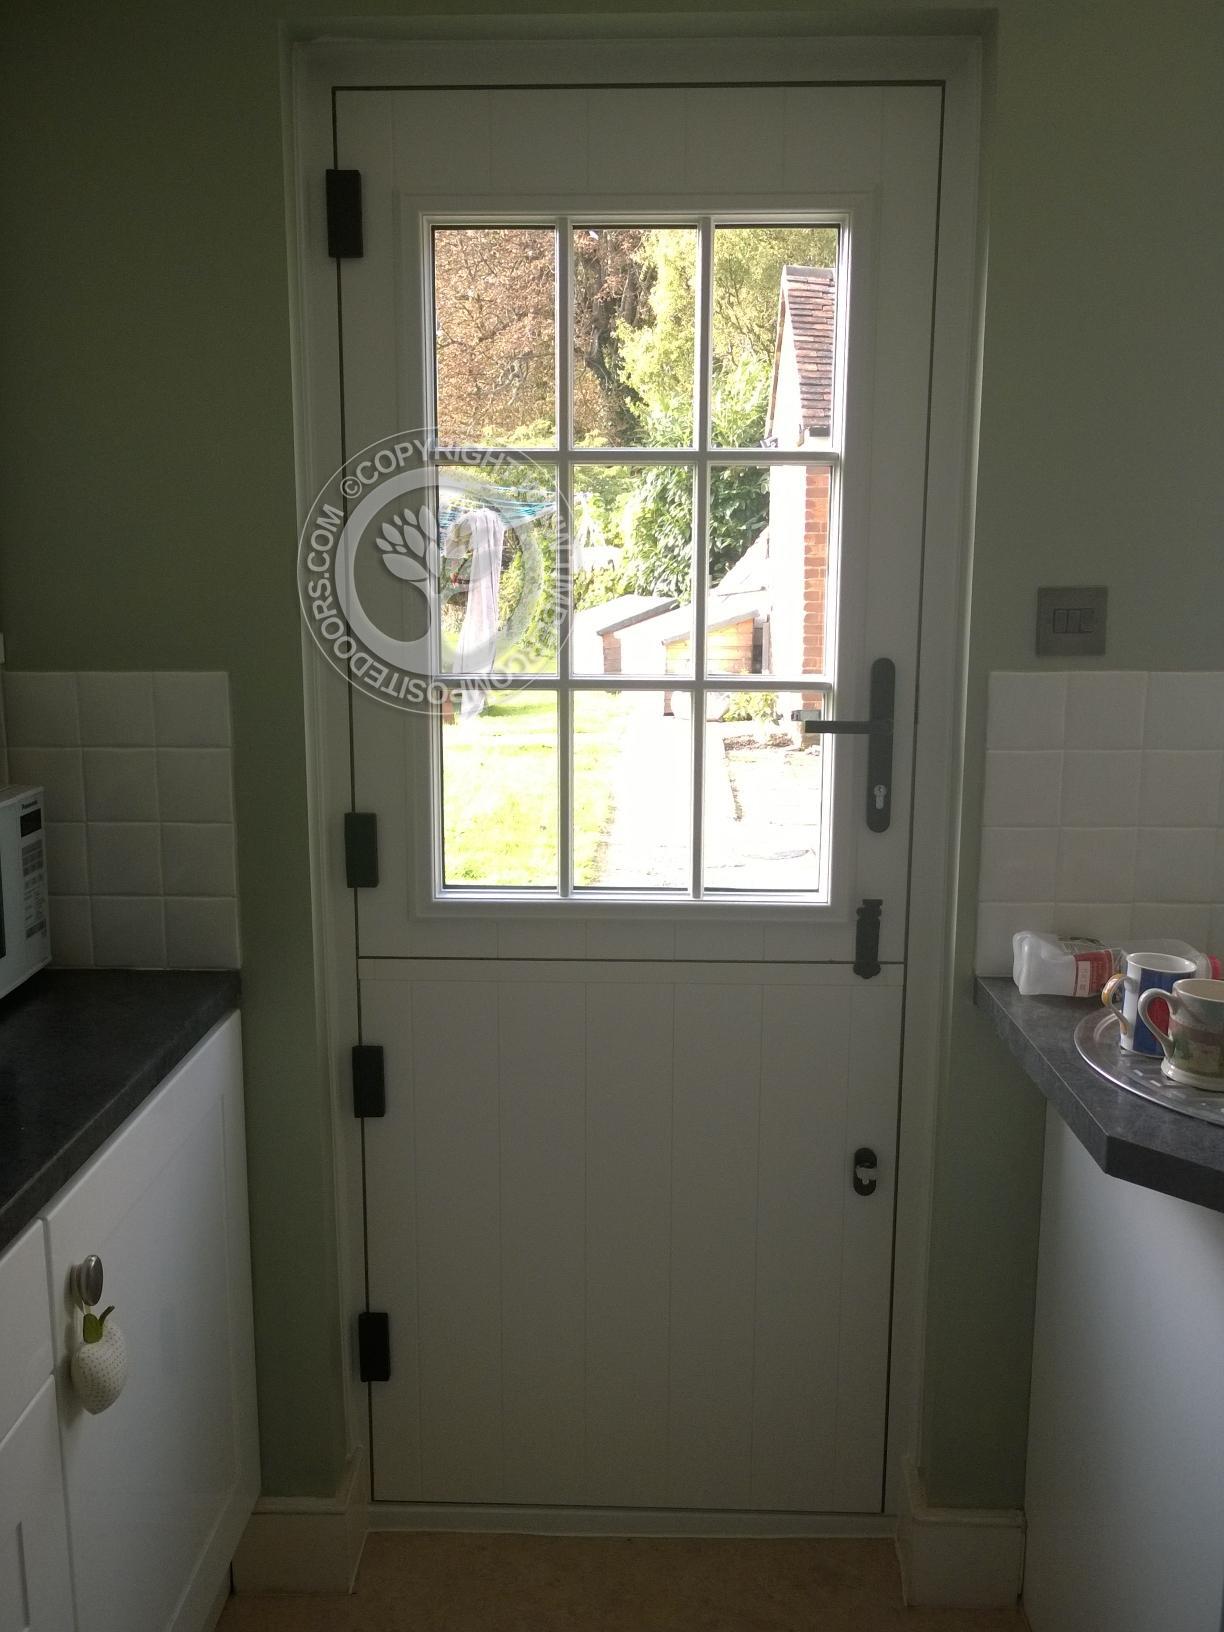 stable door security no probs timber composite doors blog. Black Bedroom Furniture Sets. Home Design Ideas